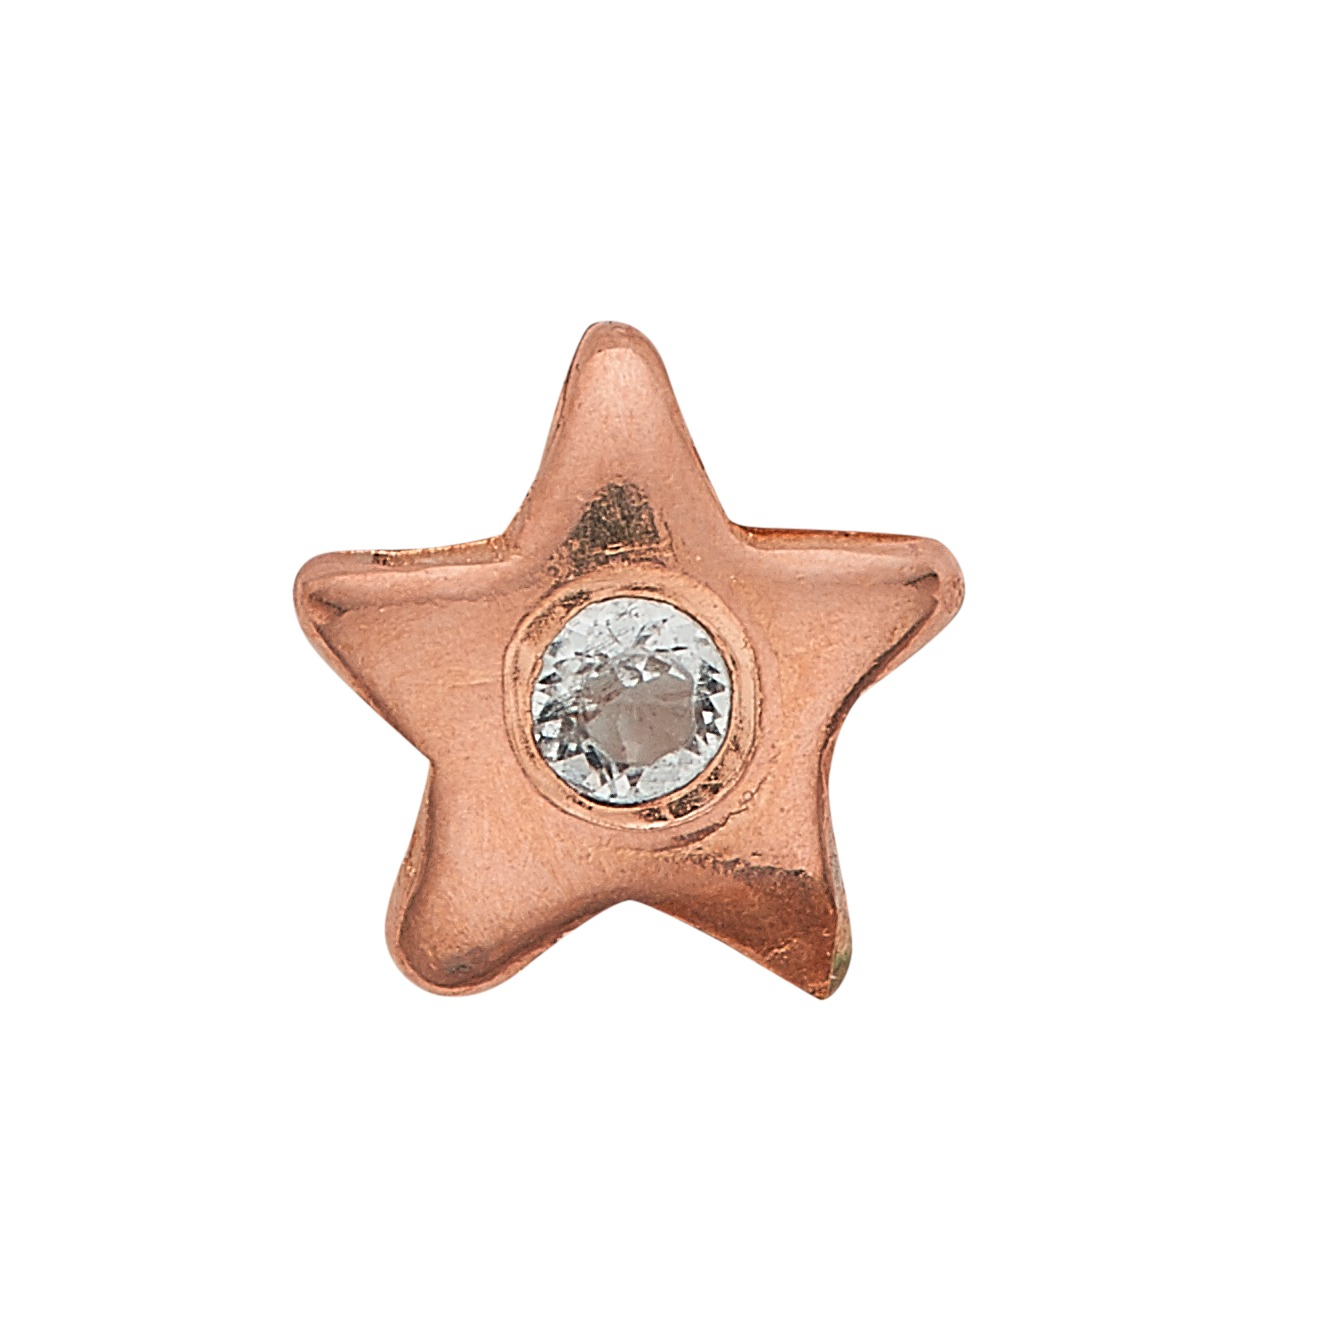 christina watches – Christina collect topaz star - 603-r5 fra brodersen + kobborg